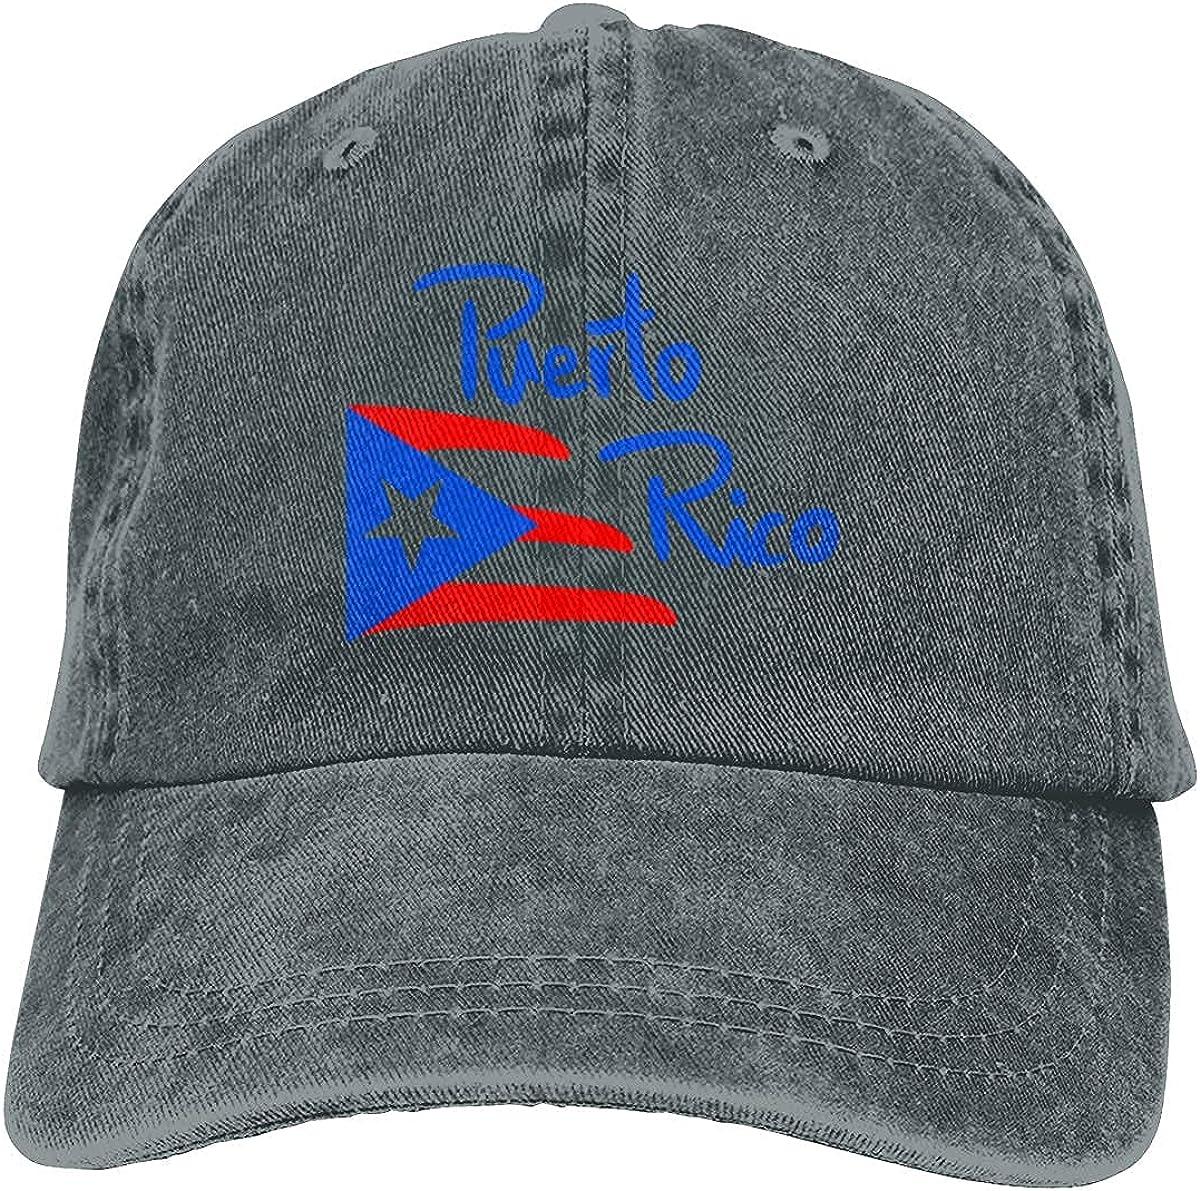 Classics Unisex Puerto Rico Flag2 Adjustable Hat Cowboy Cap for Mens&Womens Black